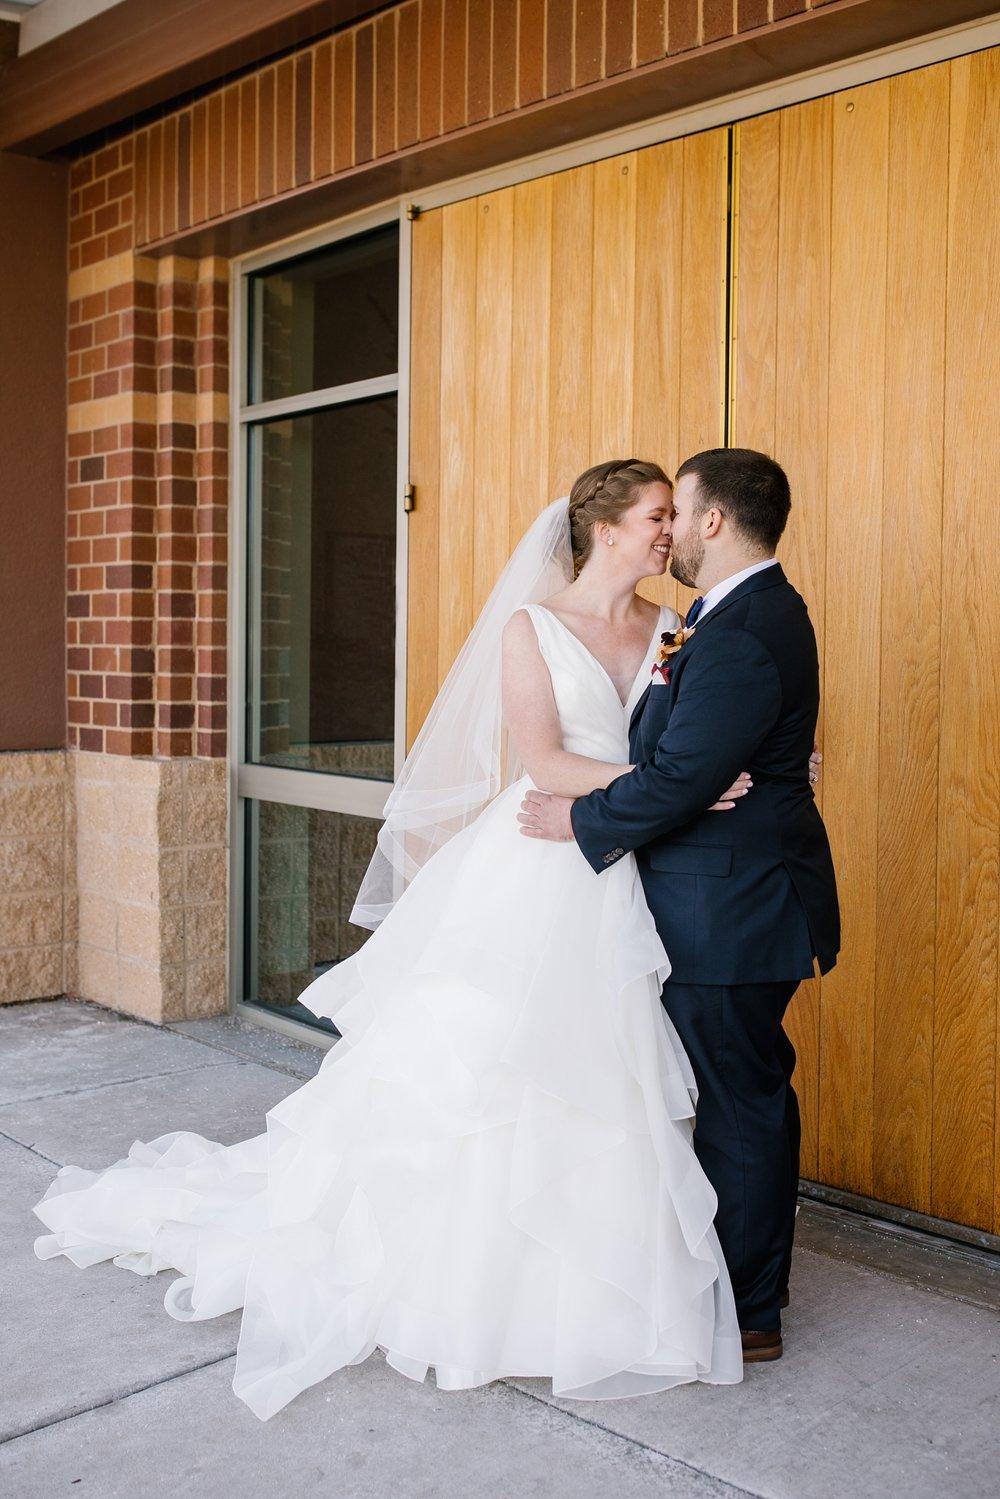 CN-Wedding-73_Lizzie-B-Imagery-Utah-Wedding-Photographer-Blessed-Sacrament-Catholic-Church-Sandy-Utah-The-Blended-Table-Salt-Lake-City.jpg